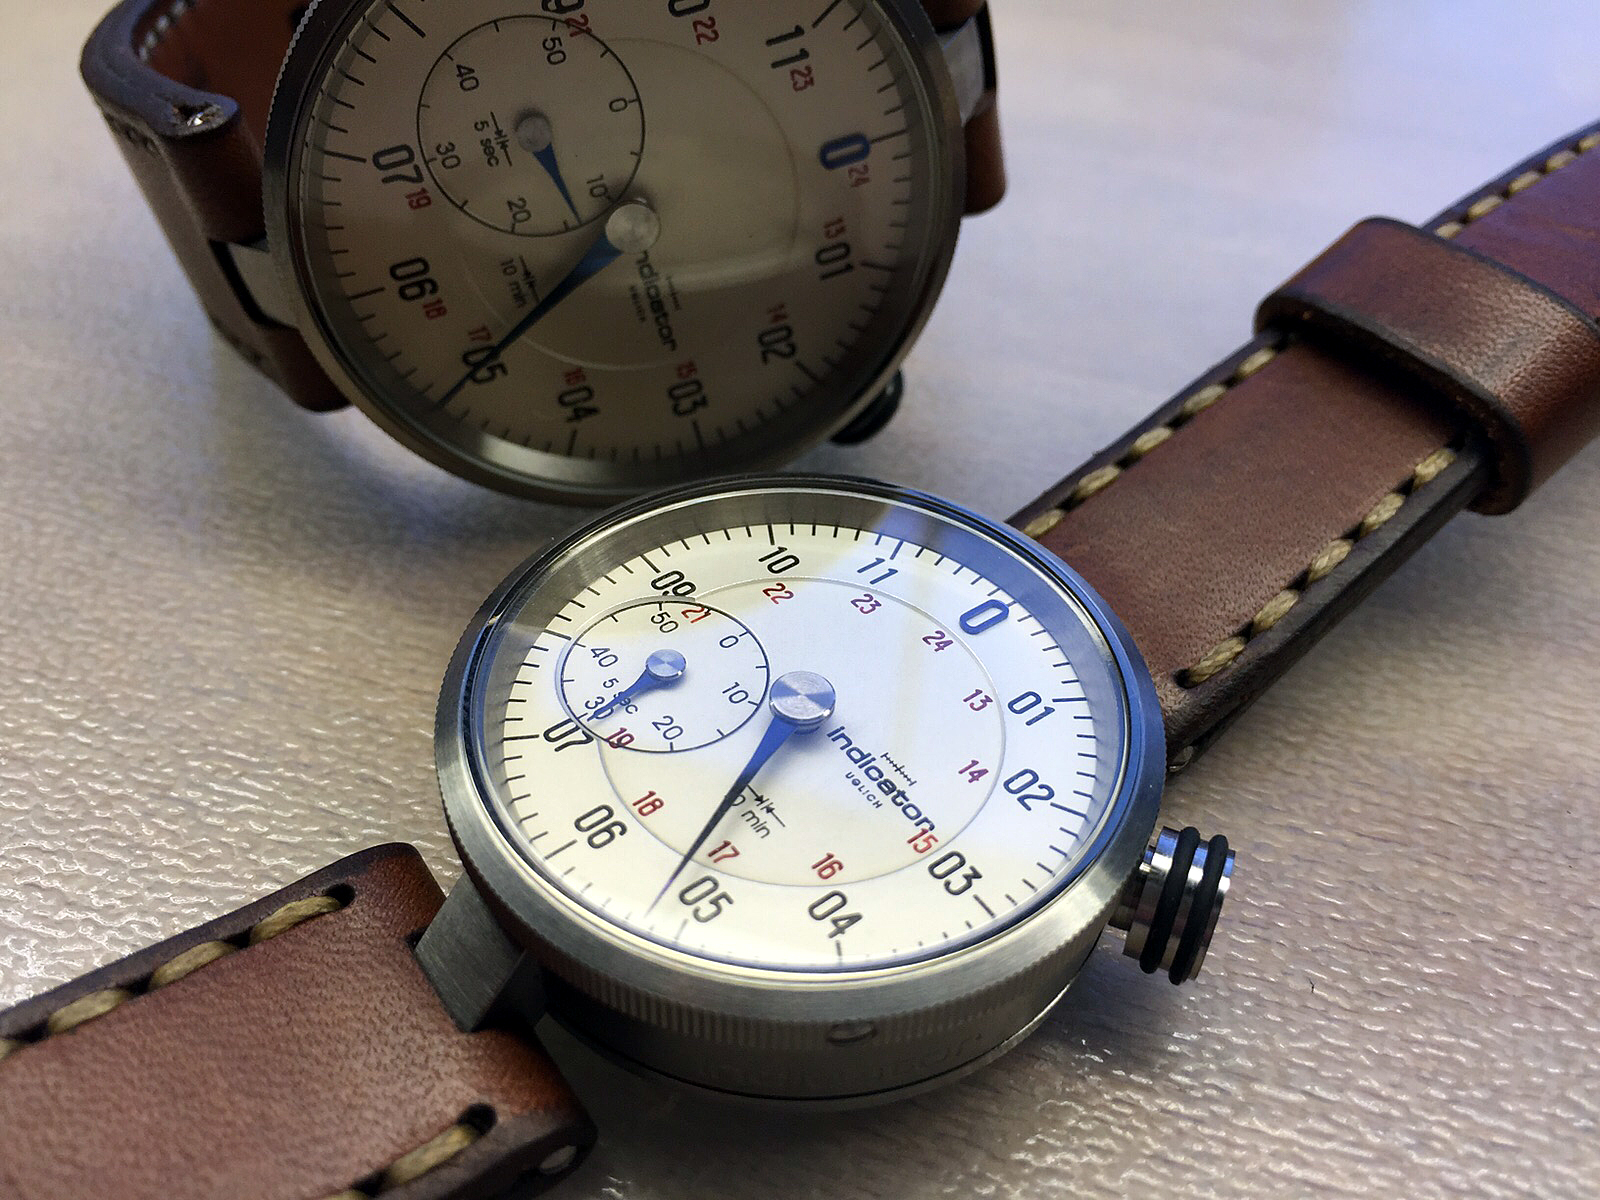 New RUSSIAN time tool INDICATOR-img-20151007-wa0013.jpg